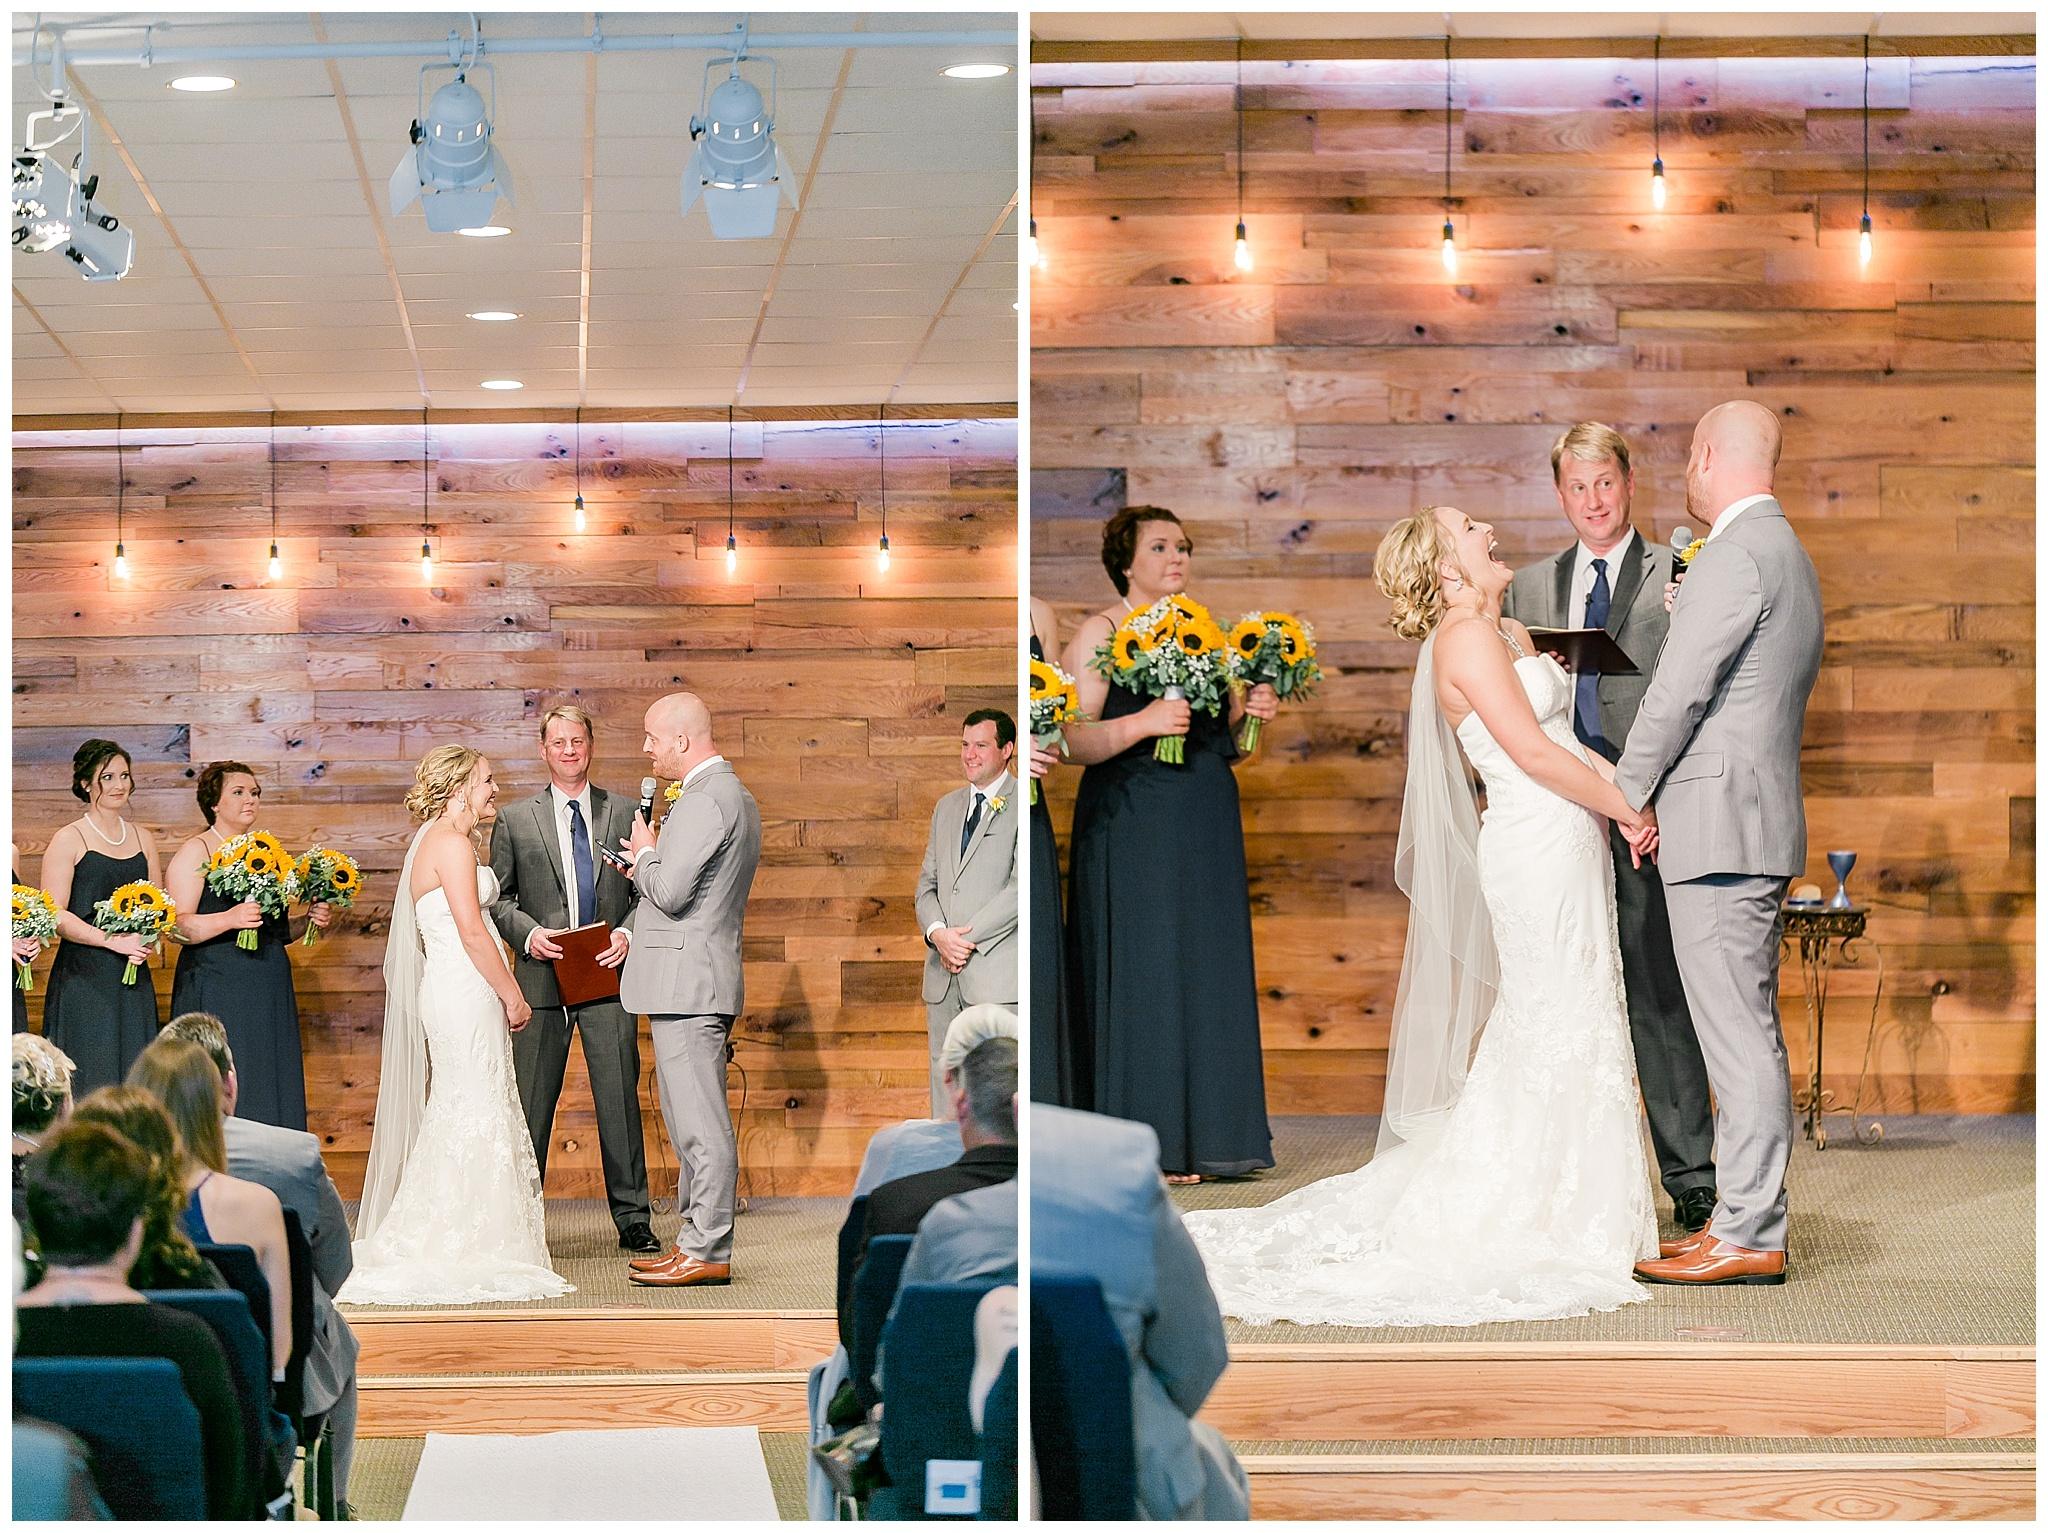 Venue_at_Milwaukee_Brewing_Company_wedding_milwaukee_wisconsin_0339.jpg